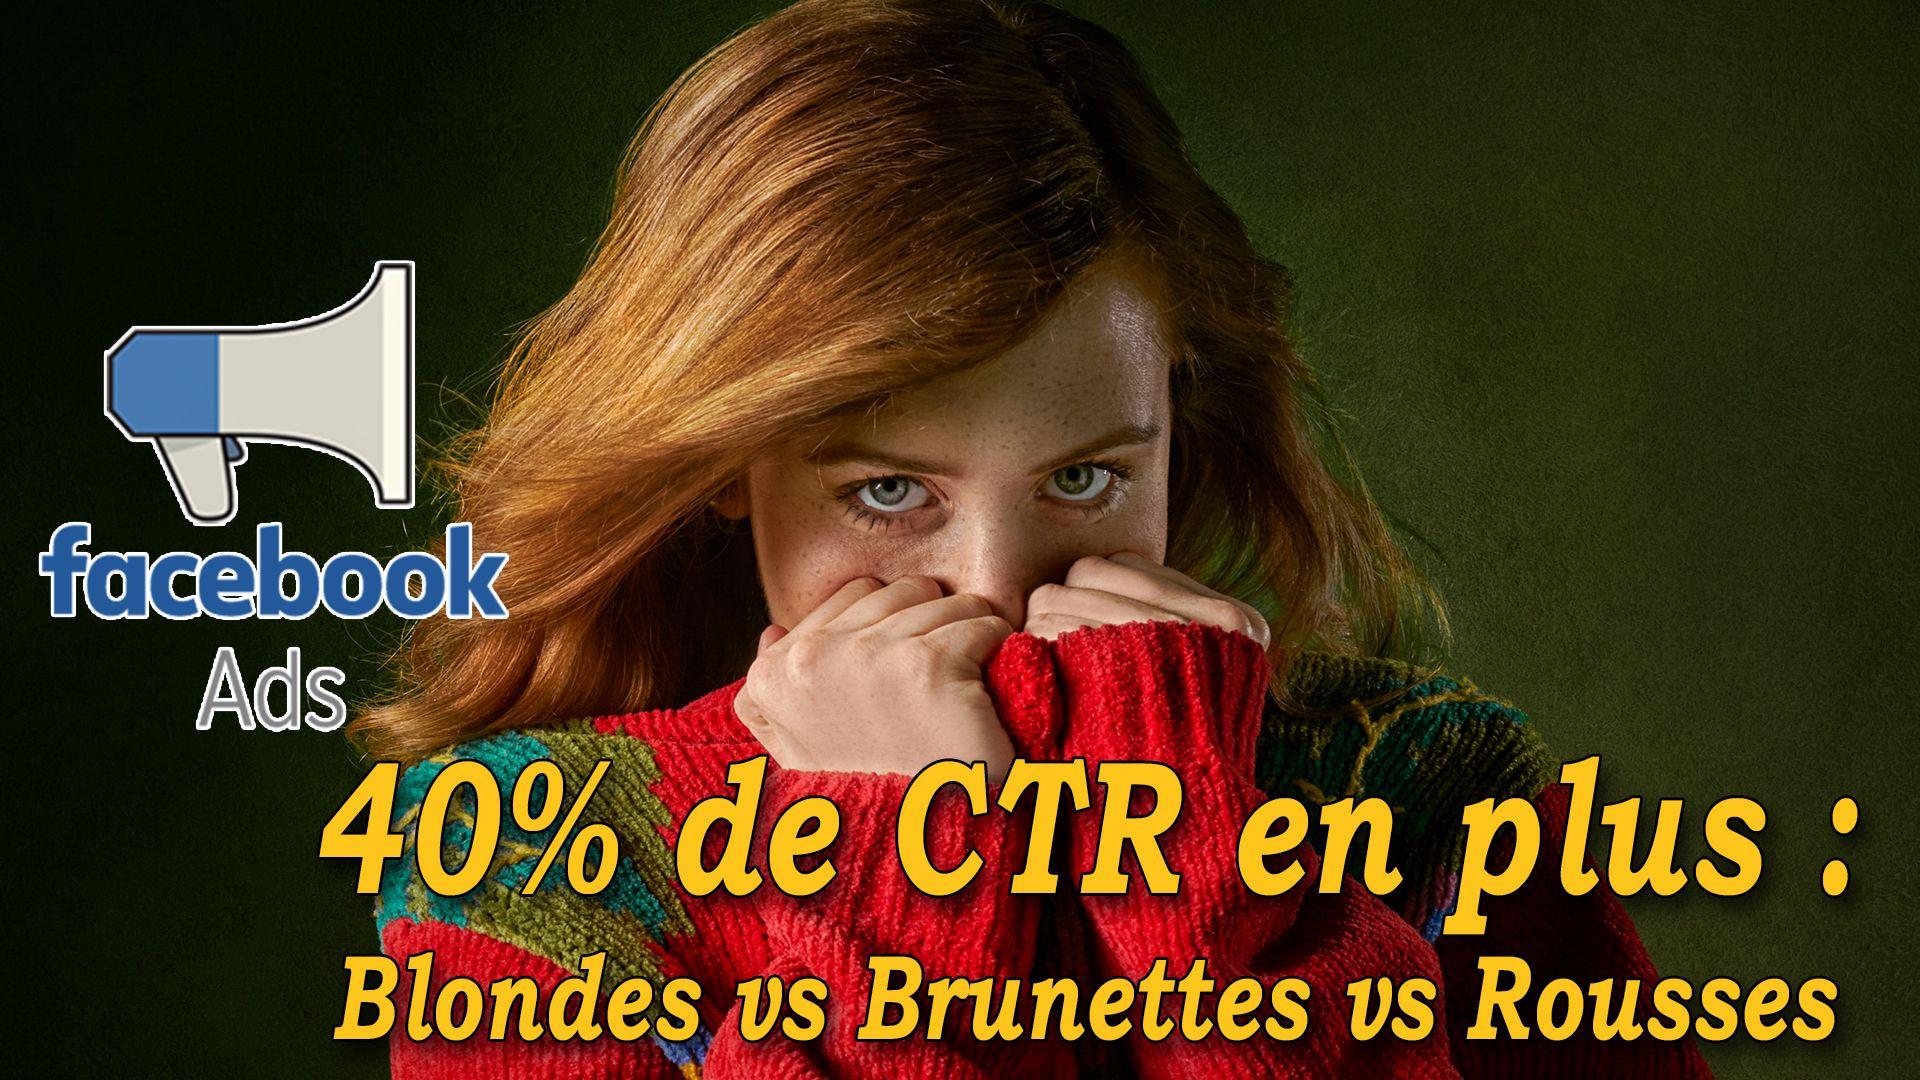 Facebook Ads : 40% de CTR en plus - Blondes vs Brunettes vs Rousses #GrowthHacking #WebMarketing #FormationGrowthHacking #CentreDeFormationFrance #TunnelAARRR #AARRR #SocialMedia #CommunityManagement #SEO #MarketingDigital #SiteWeb